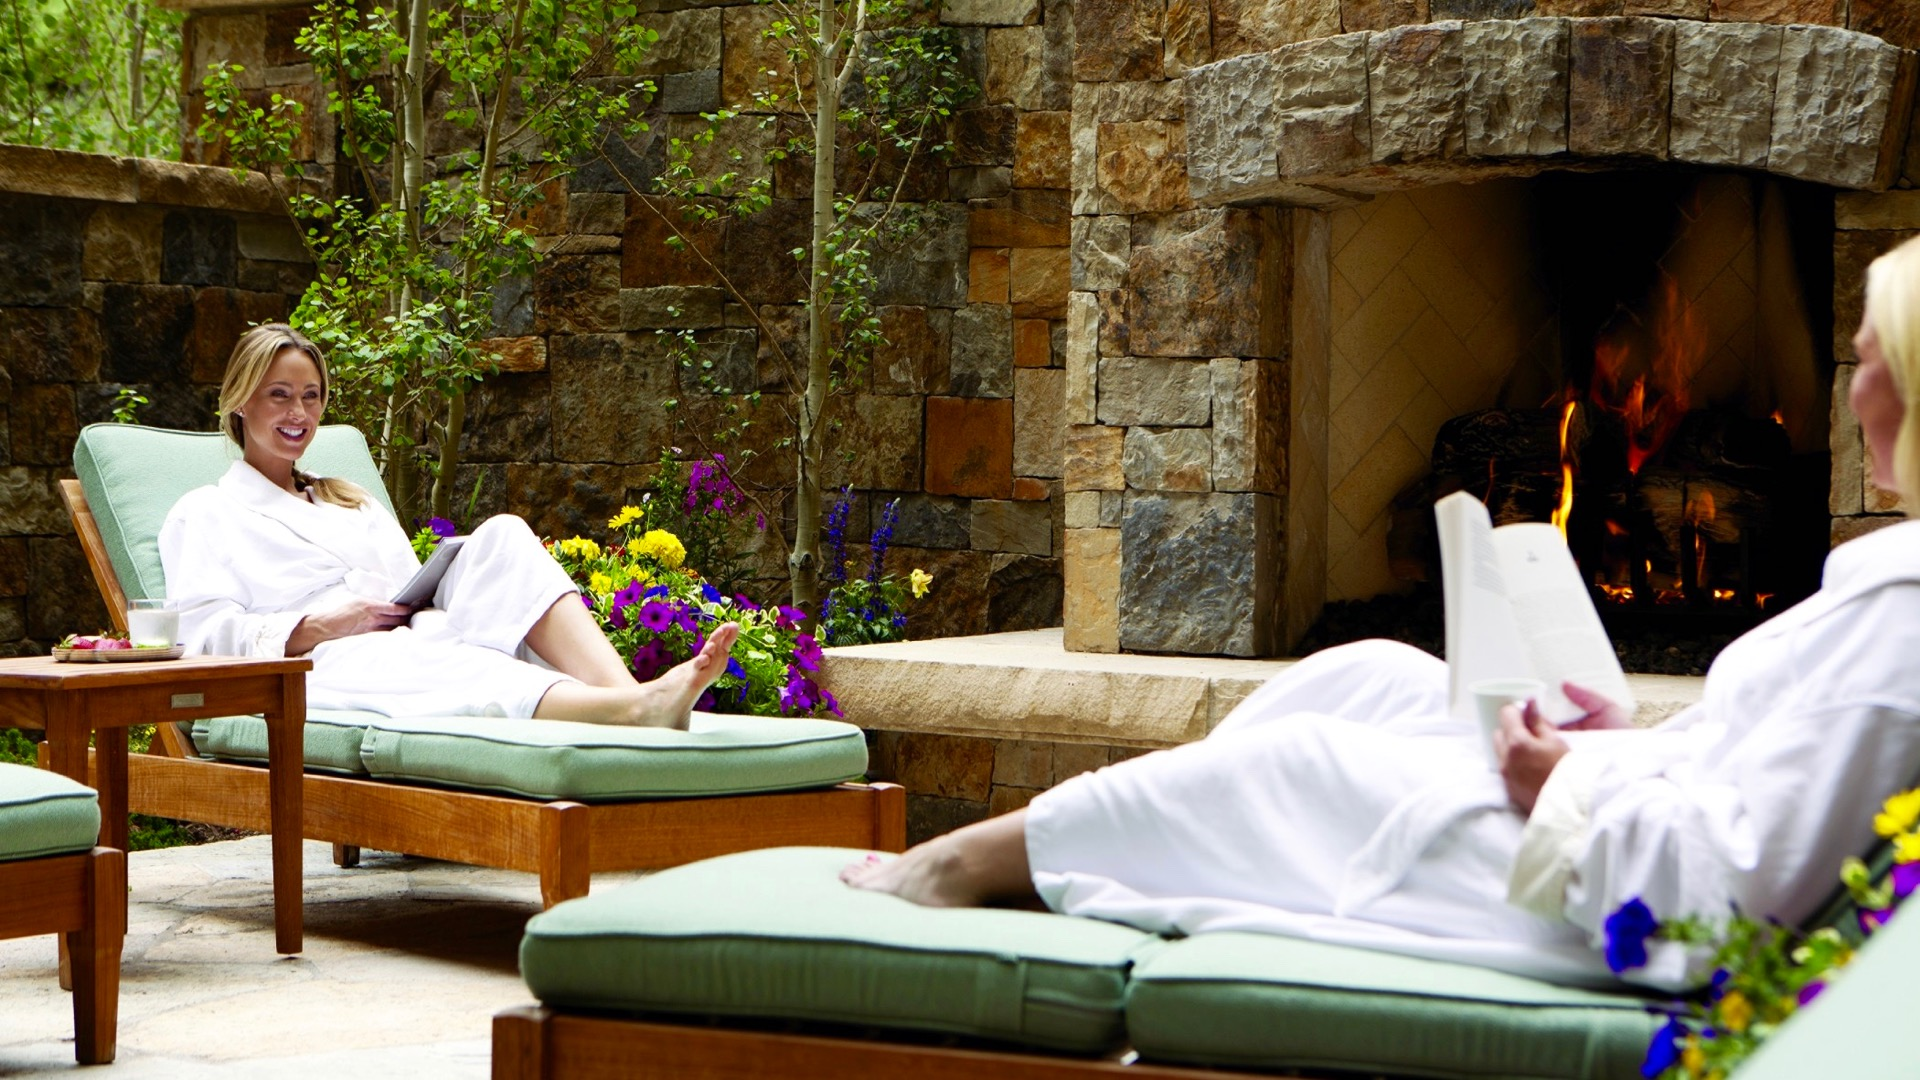 Australia gay health in lesbian resort retreat spa 15